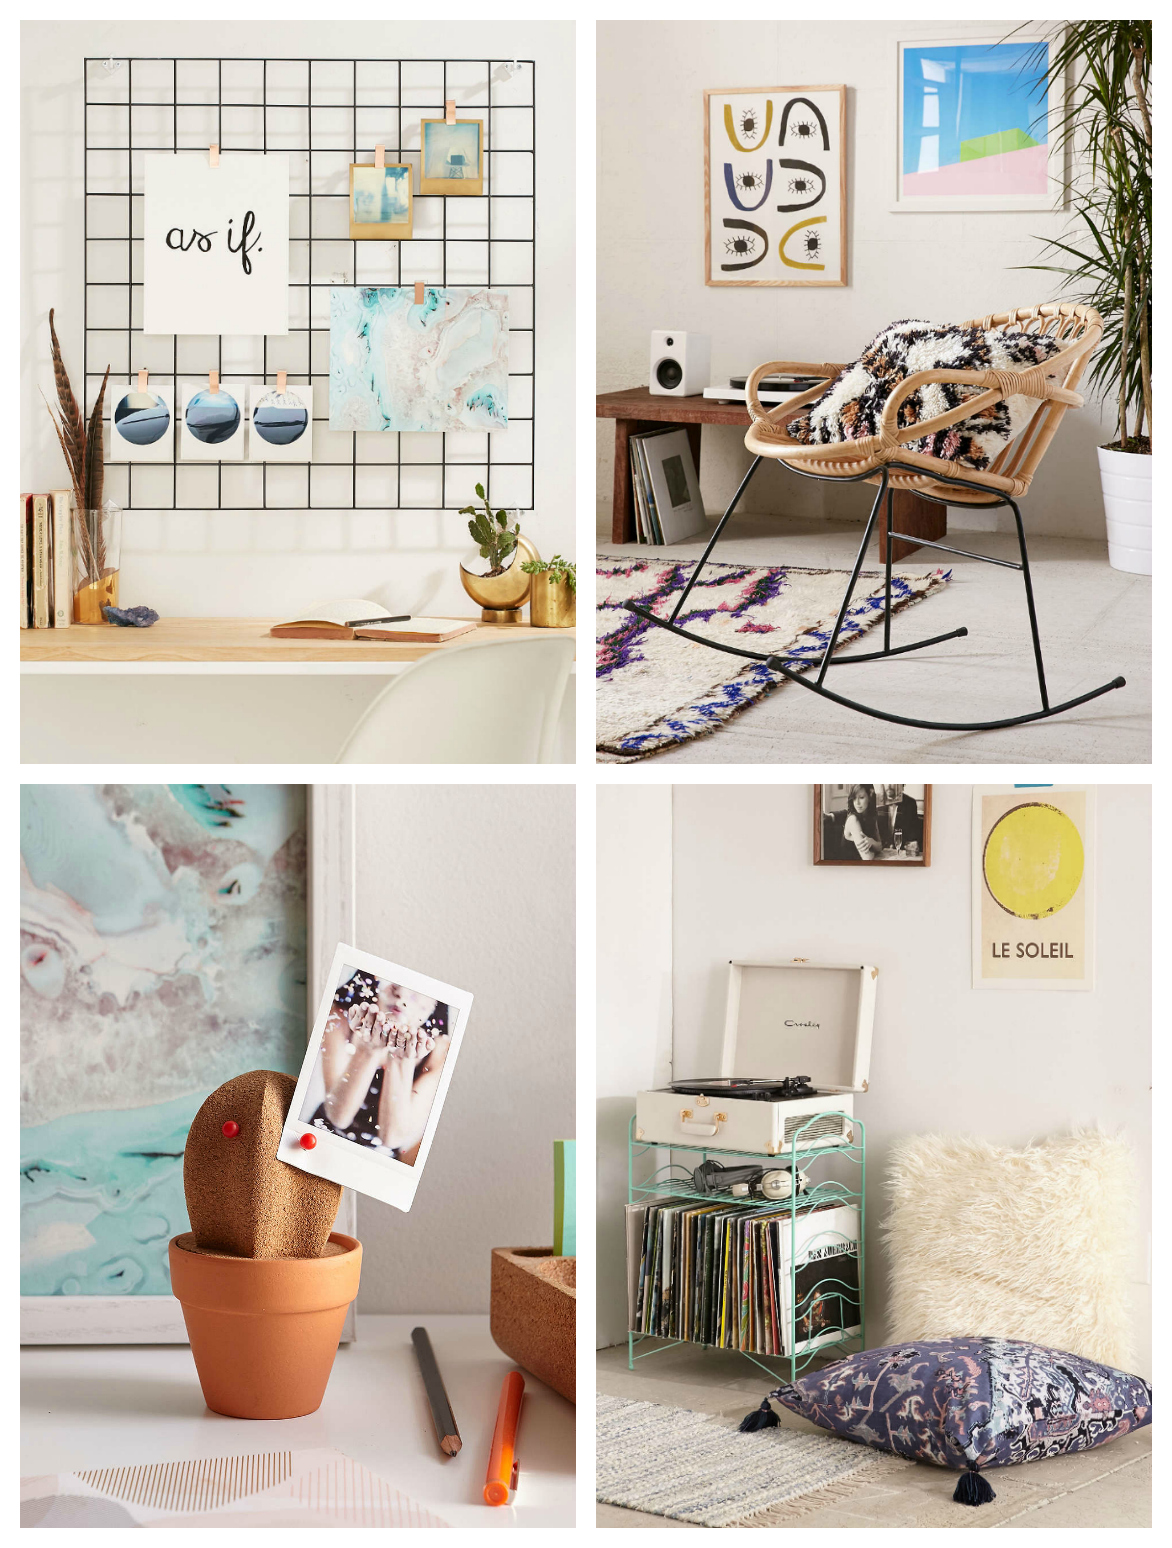 crear un espacio de trabajo, crear un espacio para escribir, ideas para un despacho